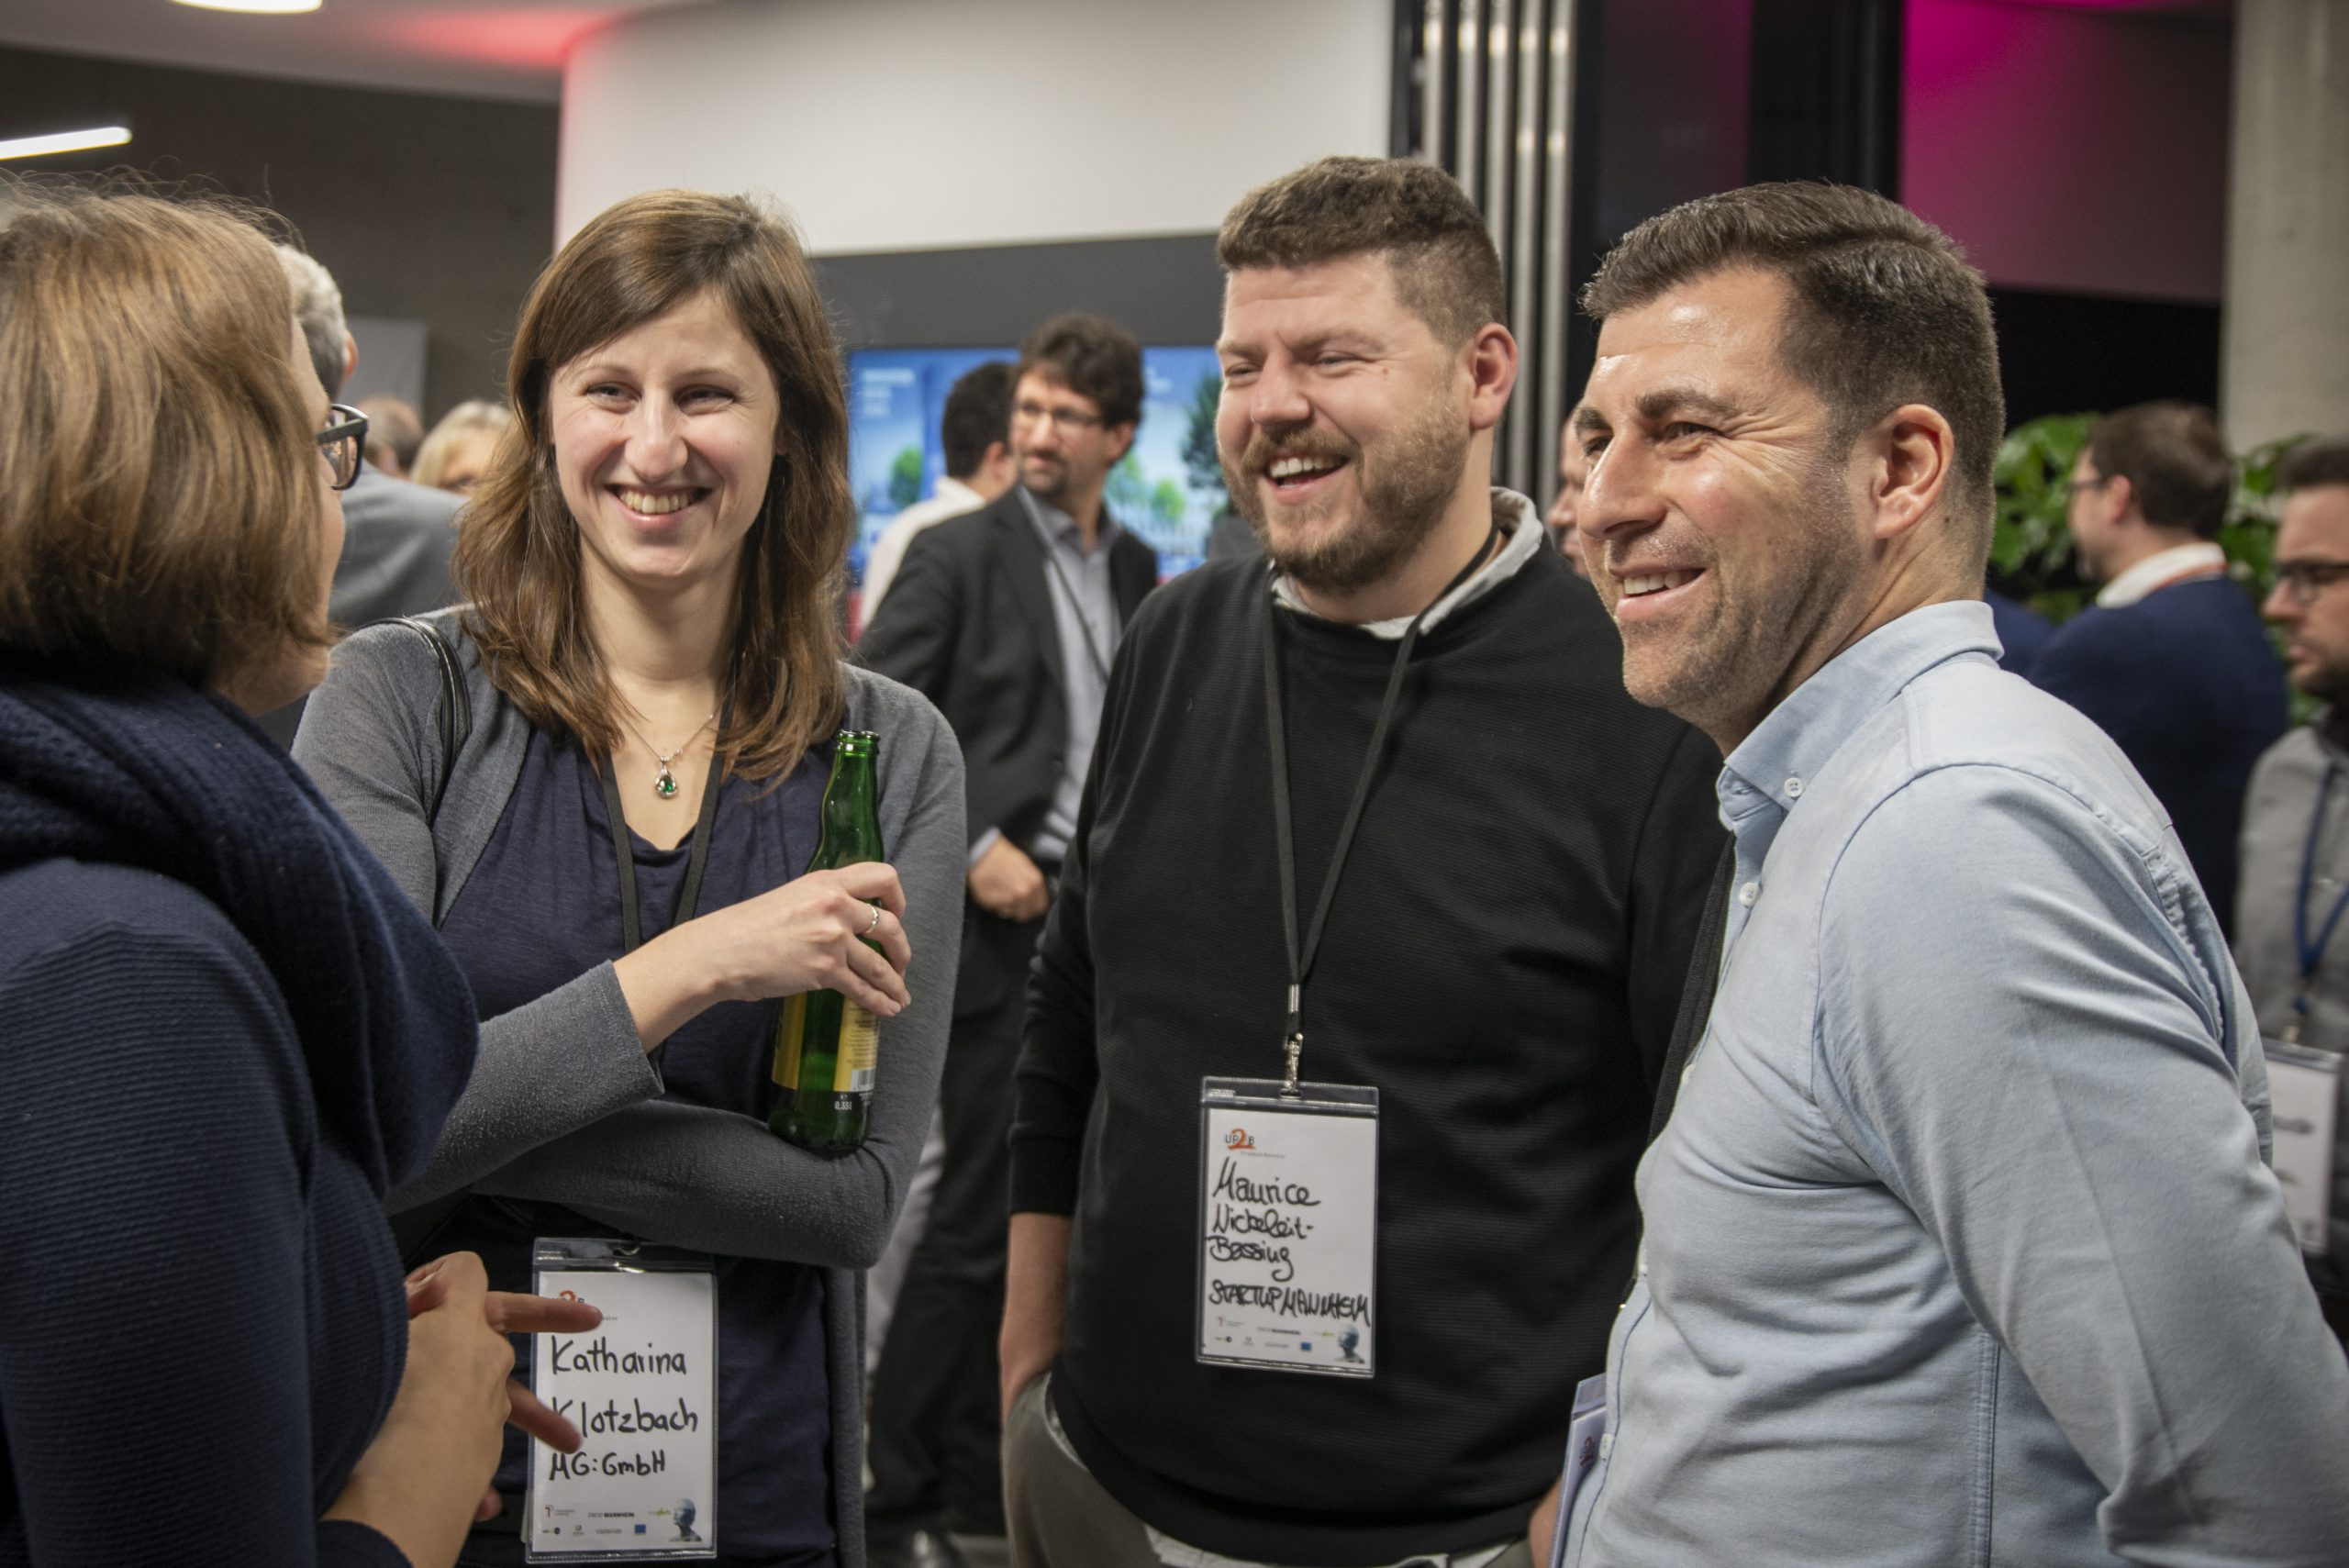 v.l. Anna Hüttl, Katharina Klotzbach, Maurice Nickeleit-Bessing, Burak Bas - Up2B Event Finale 2019